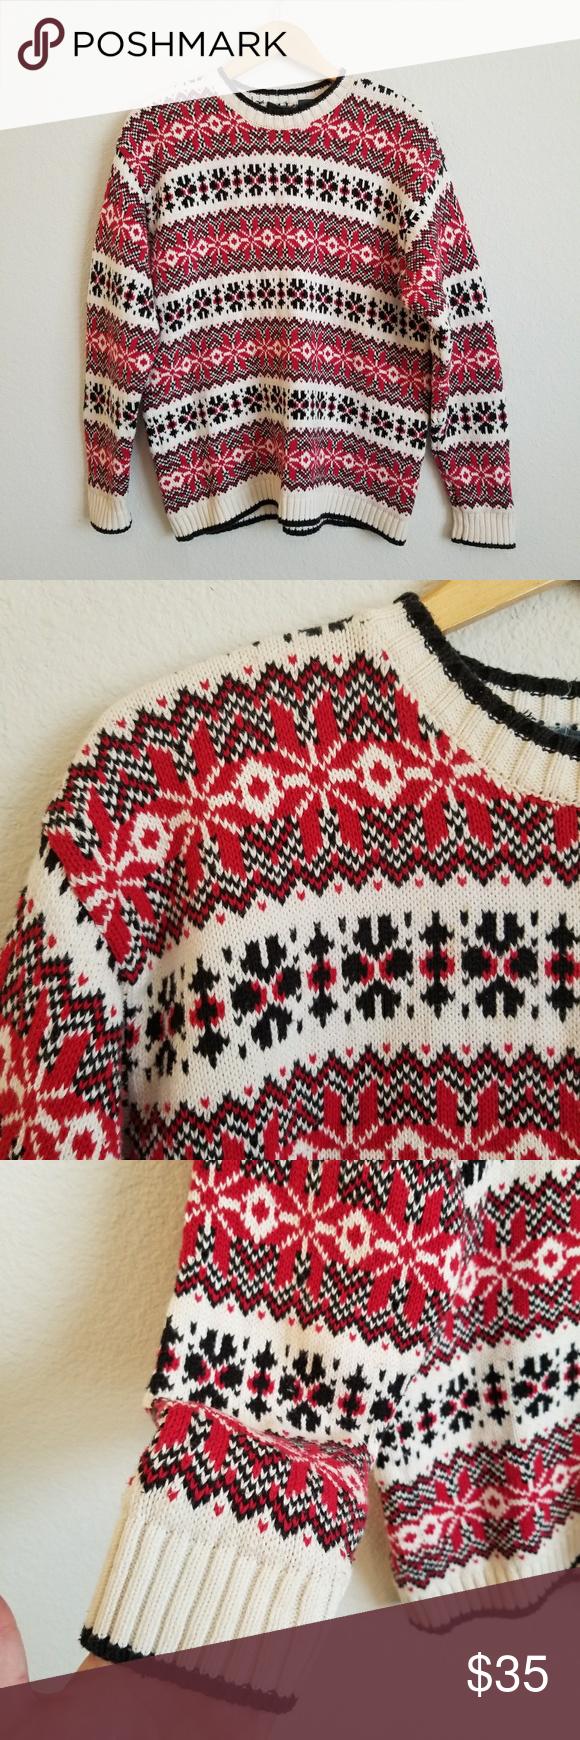 Vintage Oversized Knit Poinsettia Pattern Sweater Vintage ...